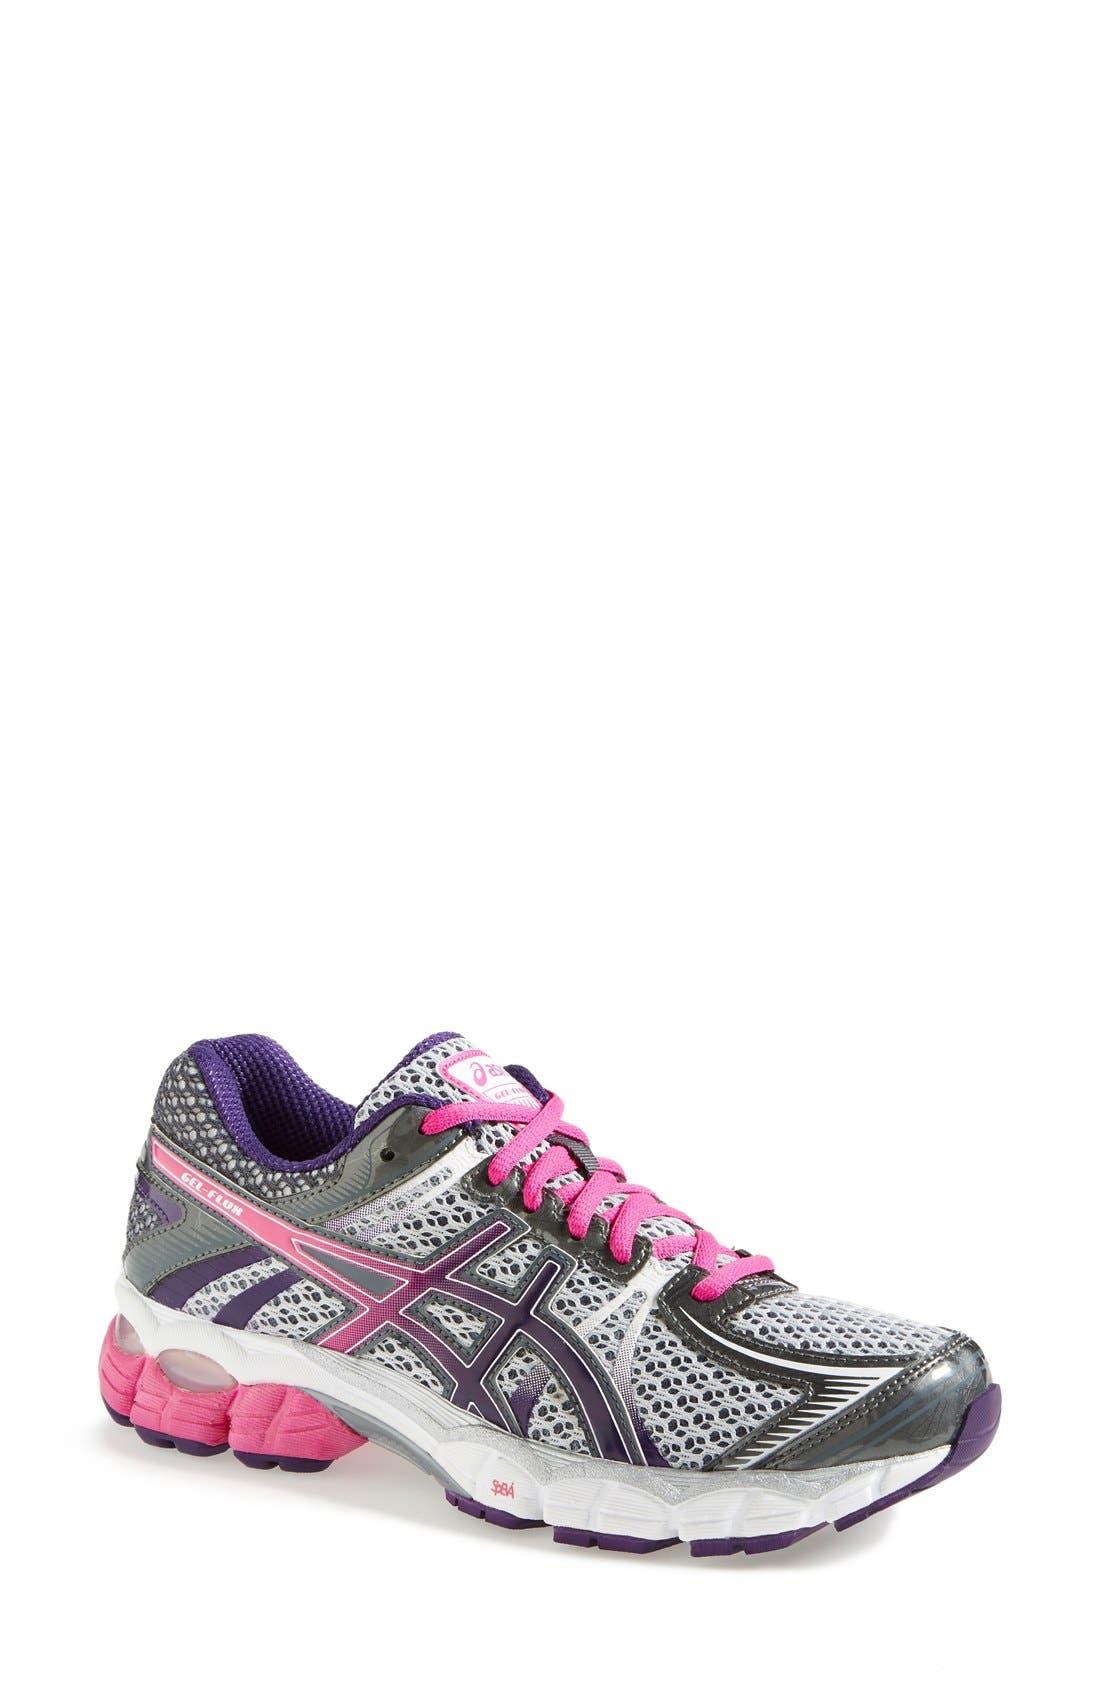 Main Image - ASICS® 'GEL-Flux' Running Shoe (Women)